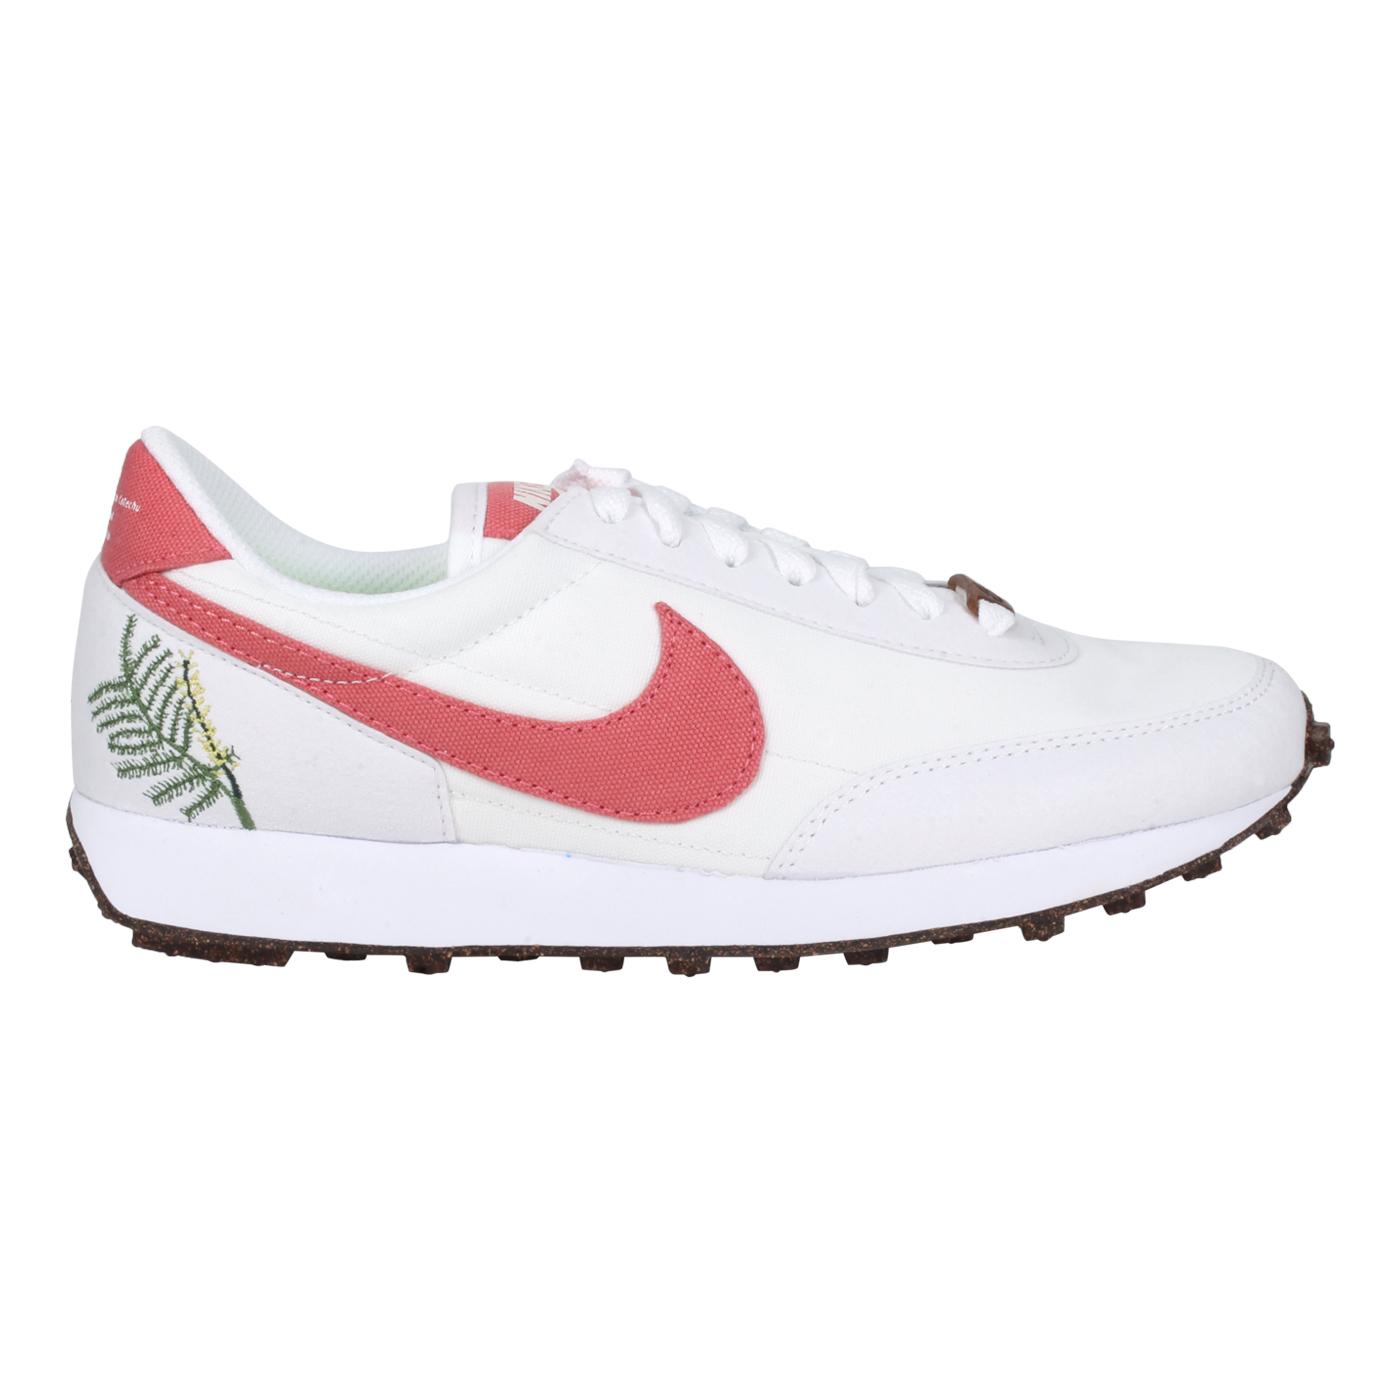 NIKE 女款復古休閒鞋  @W DBREAK SE@DJ1299100 - 白粉綠